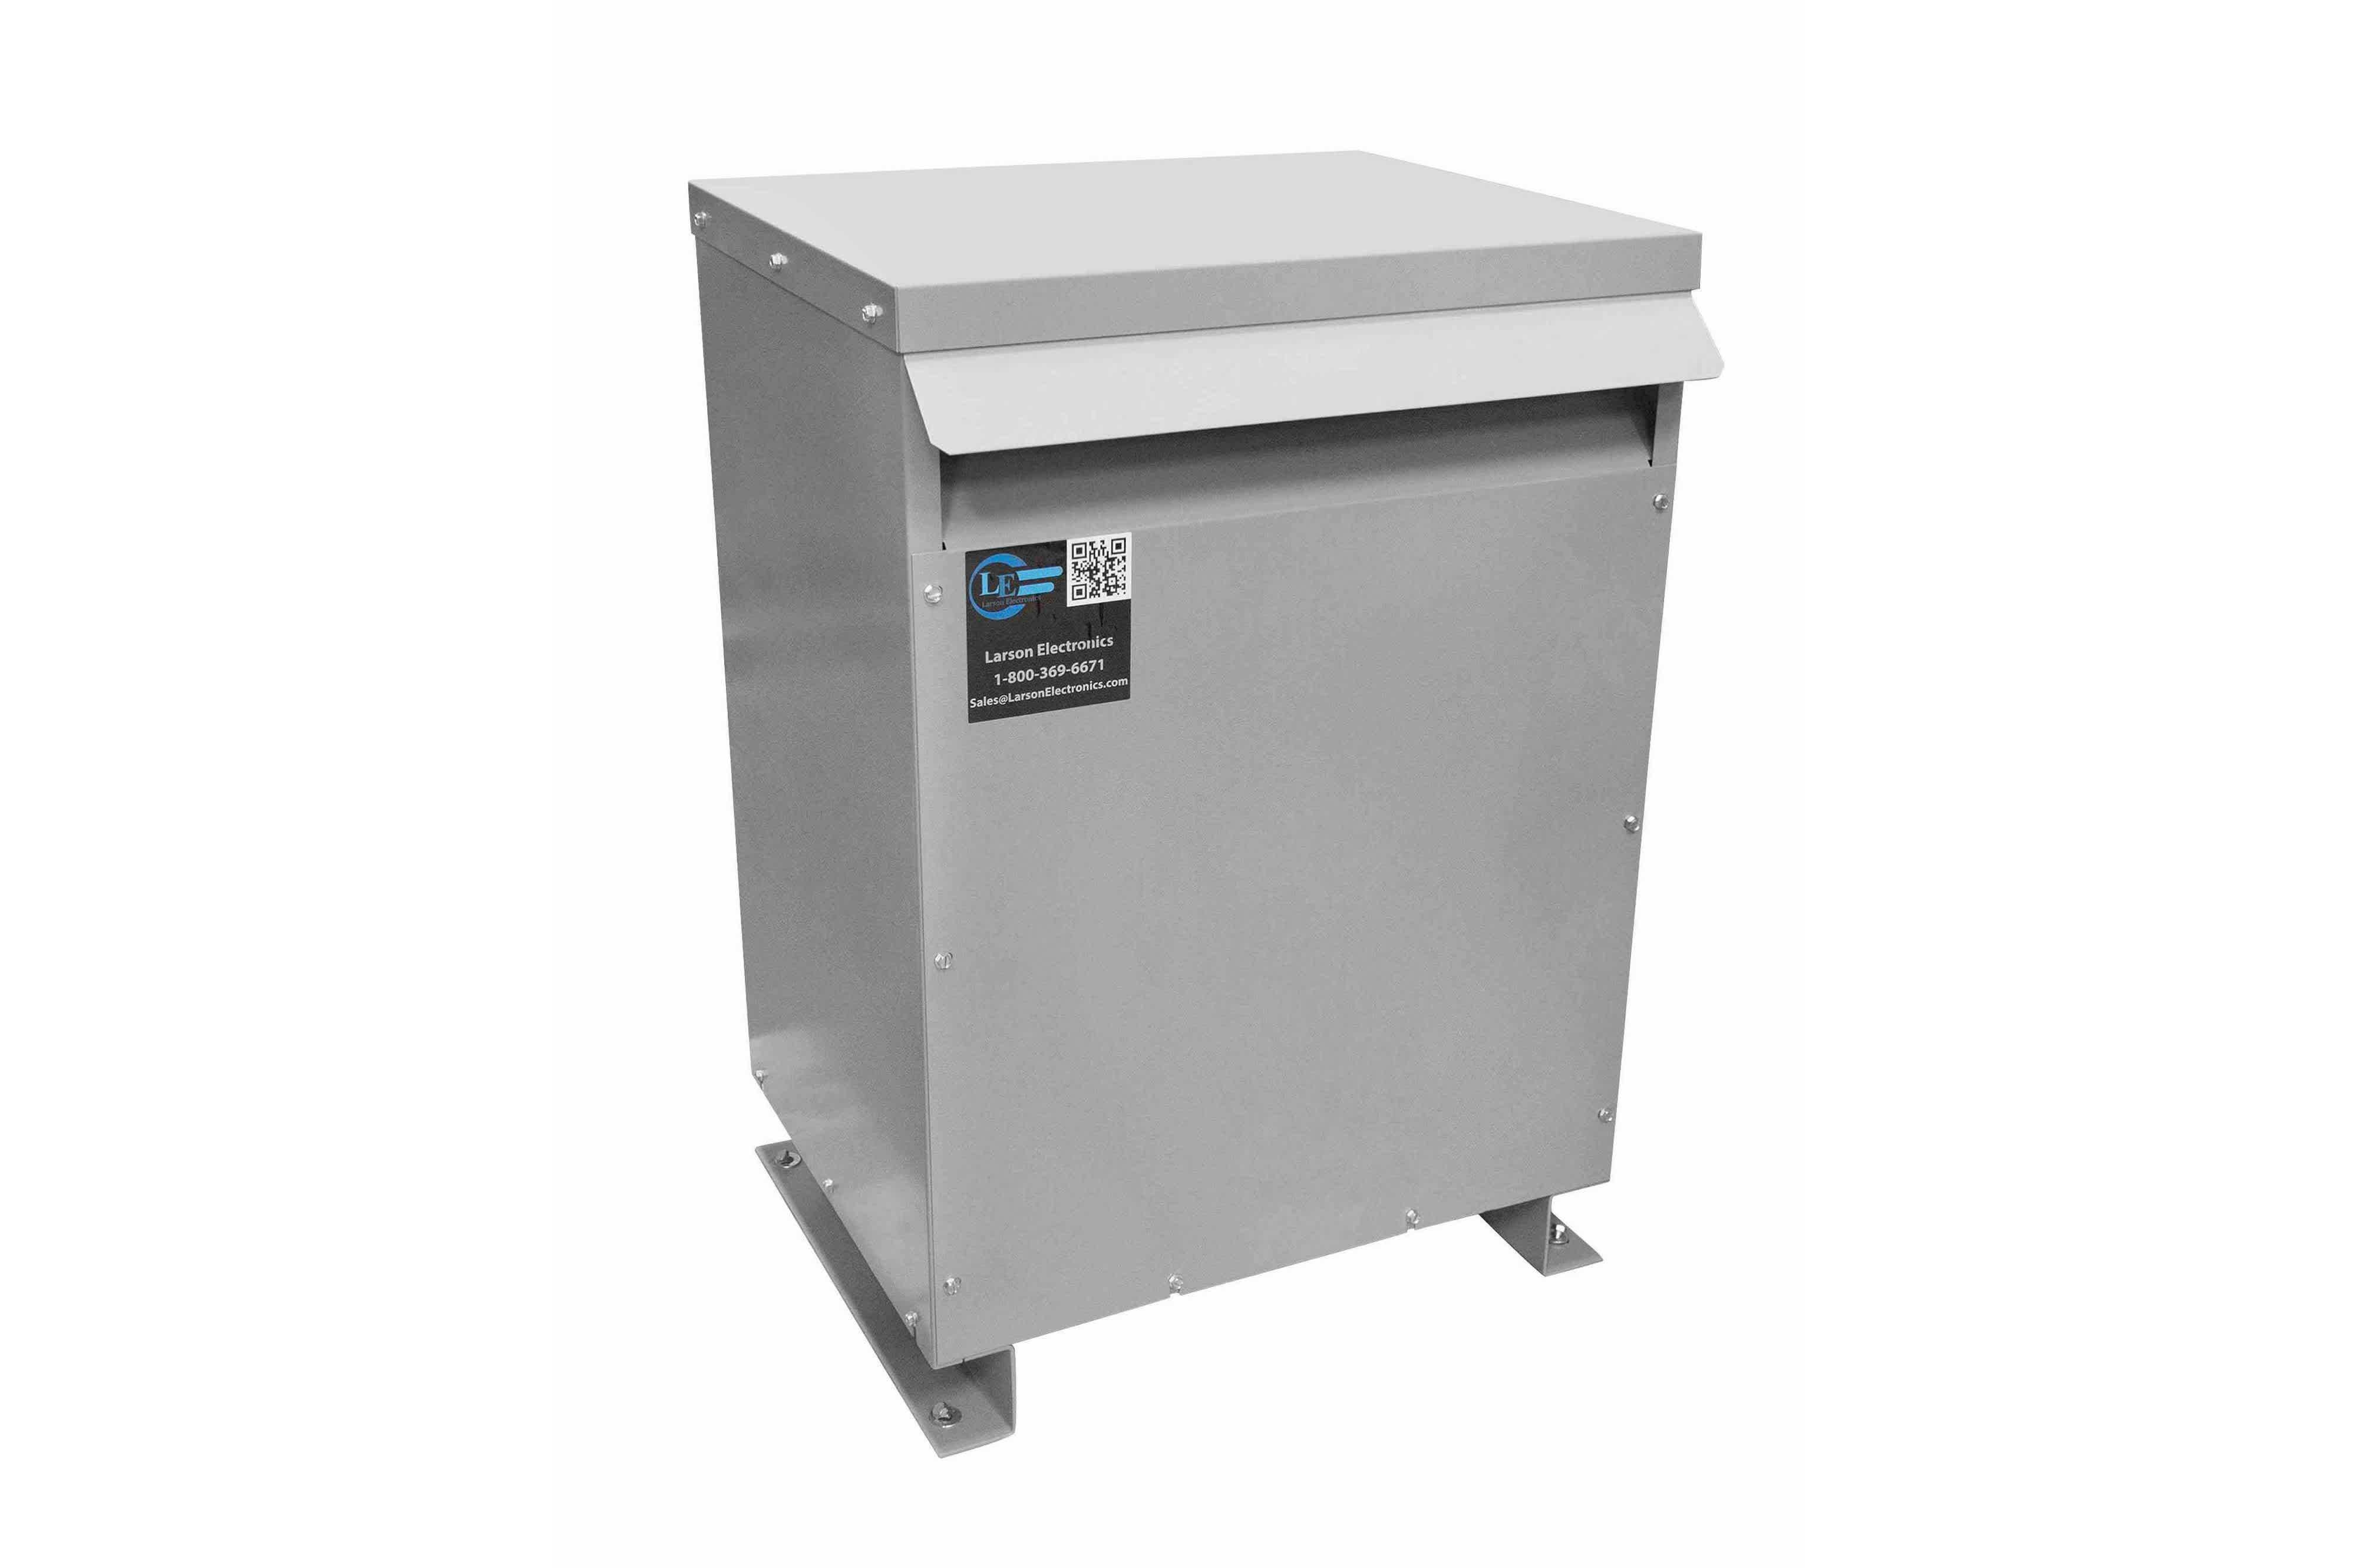 35 kVA 3PH Isolation Transformer, 440V Wye Primary, 240V Delta Secondary, N3R, Ventilated, 60 Hz